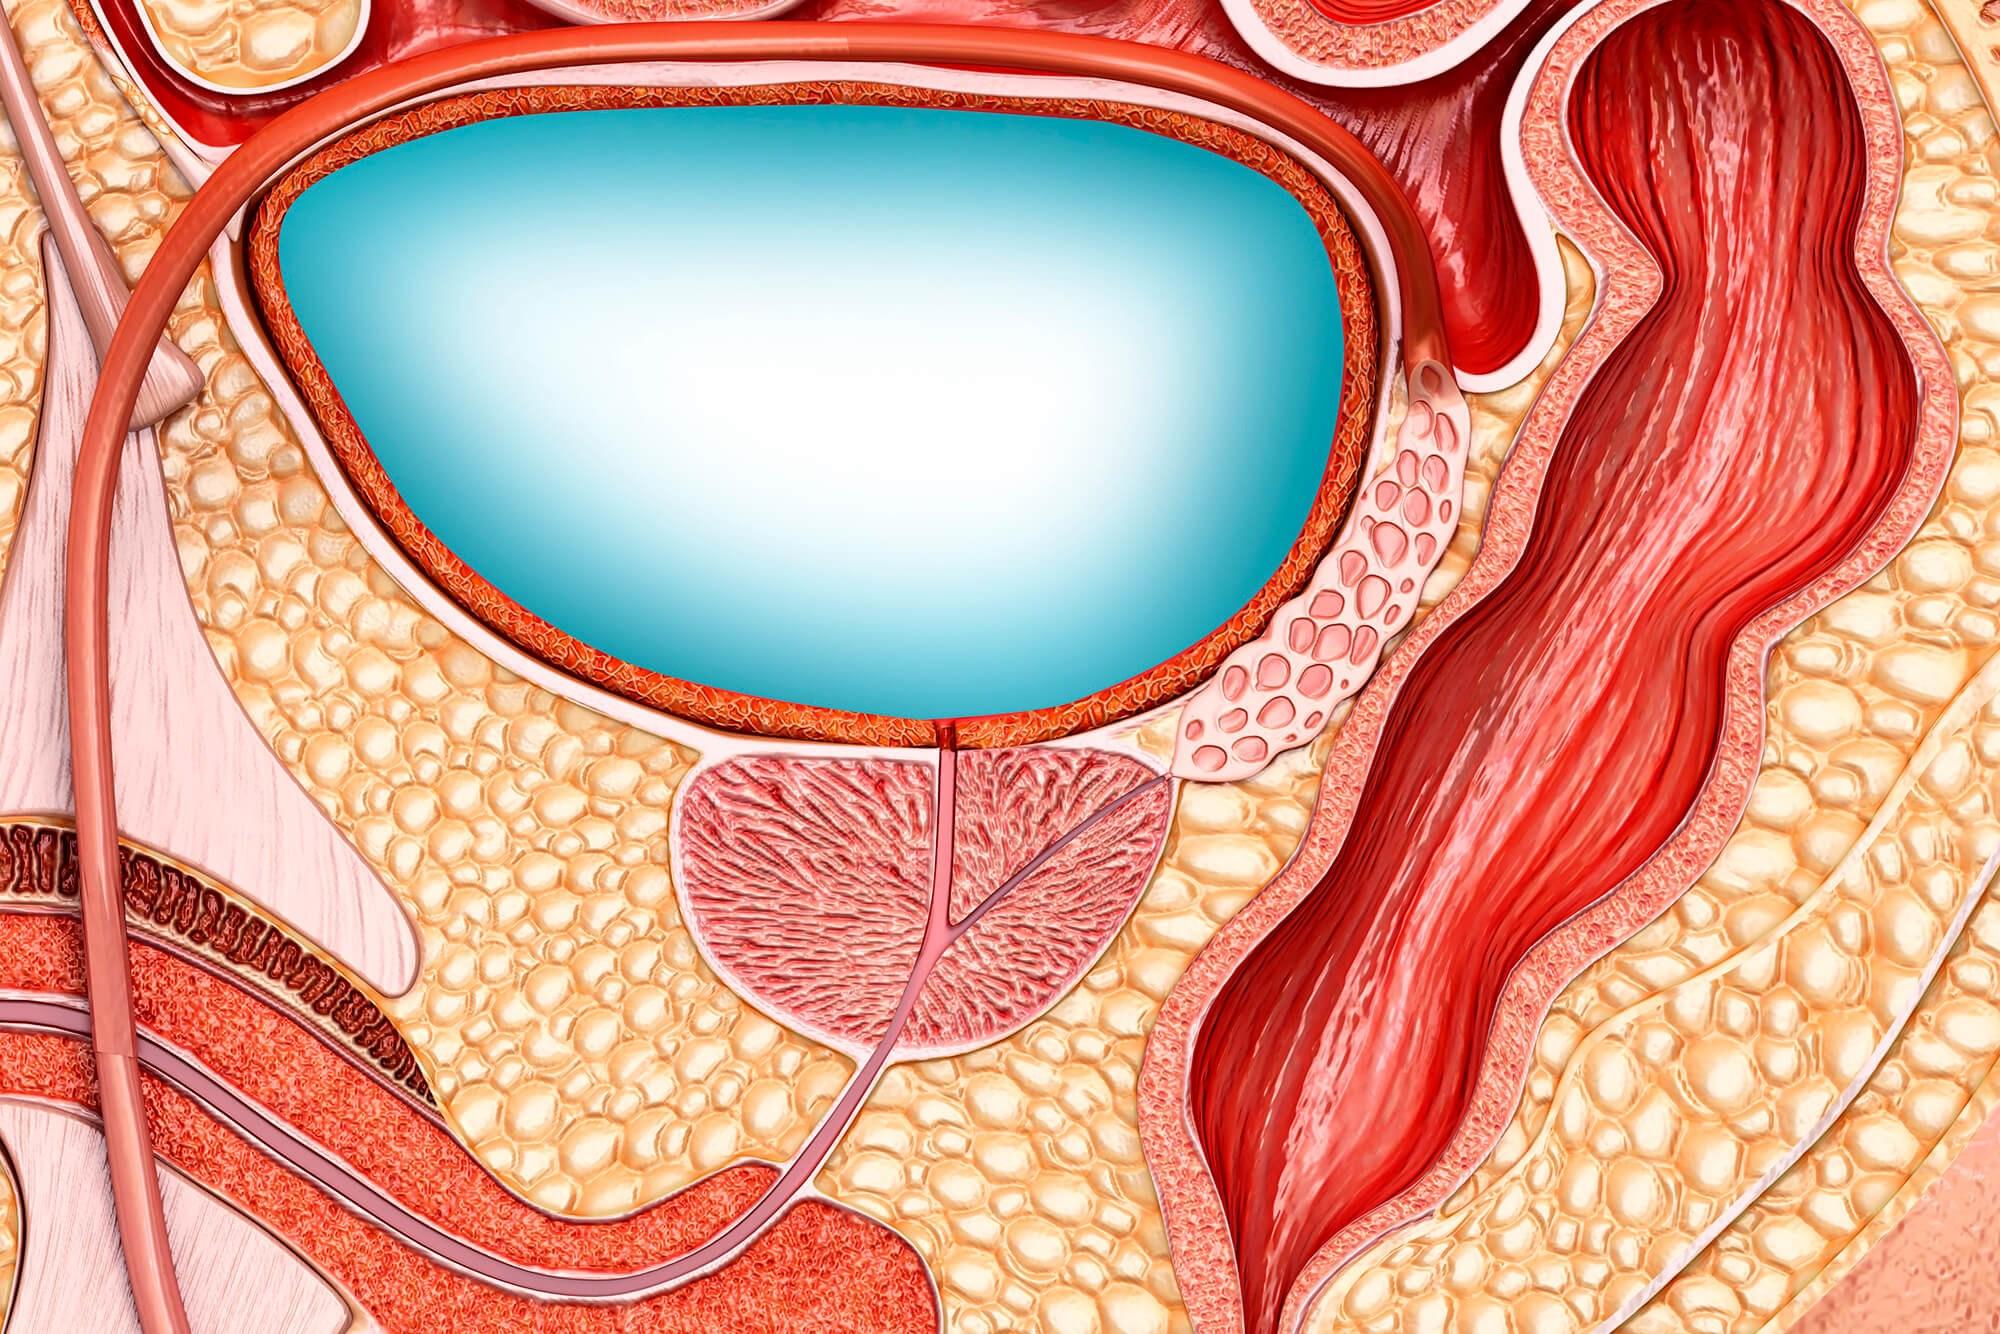 Overactive Bladder Linked to Prostate Cancer ADT